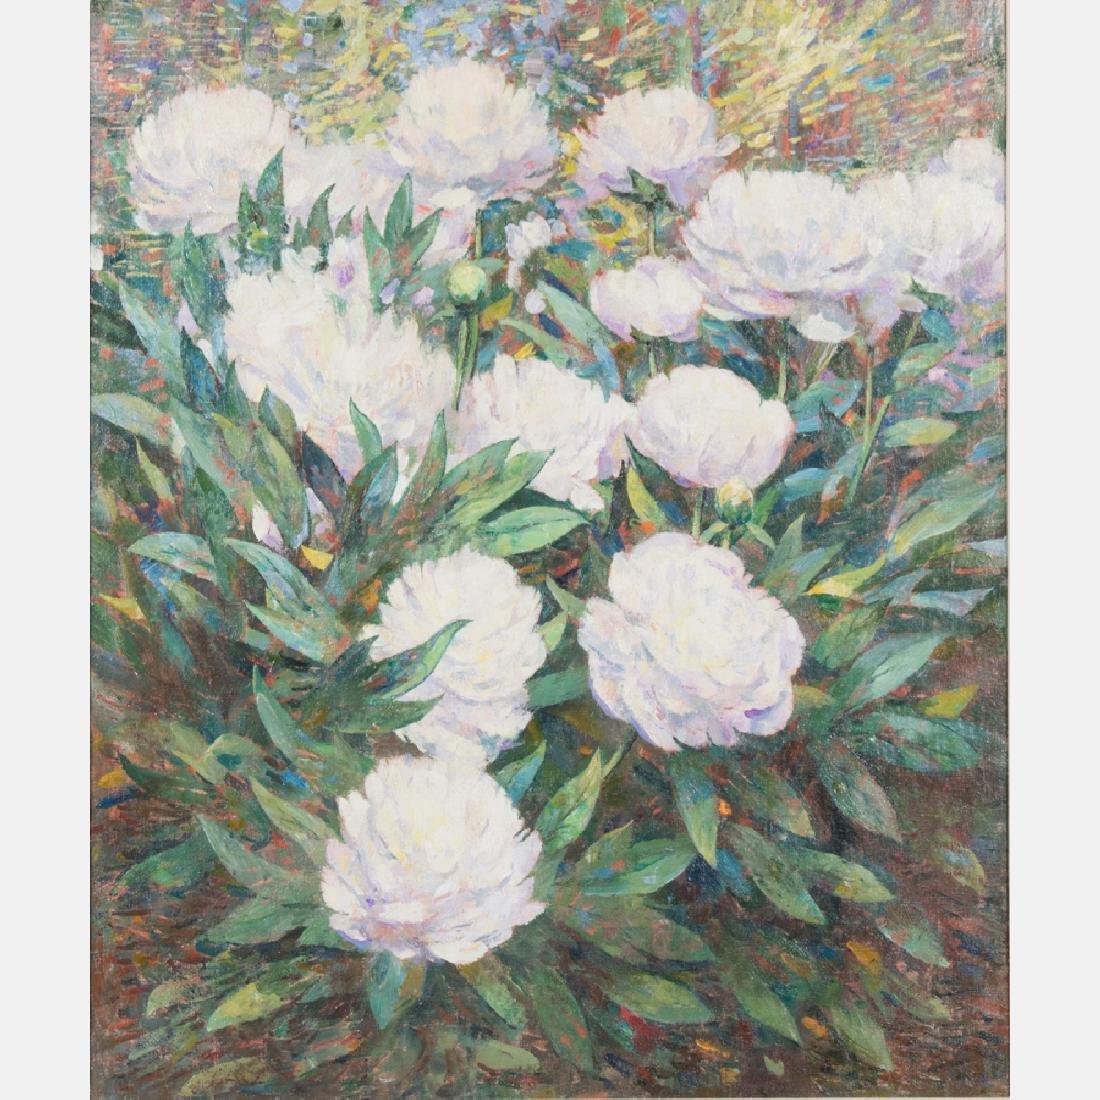 Dines Carlsen (1901-1966) Peonies, Oil on canvas,